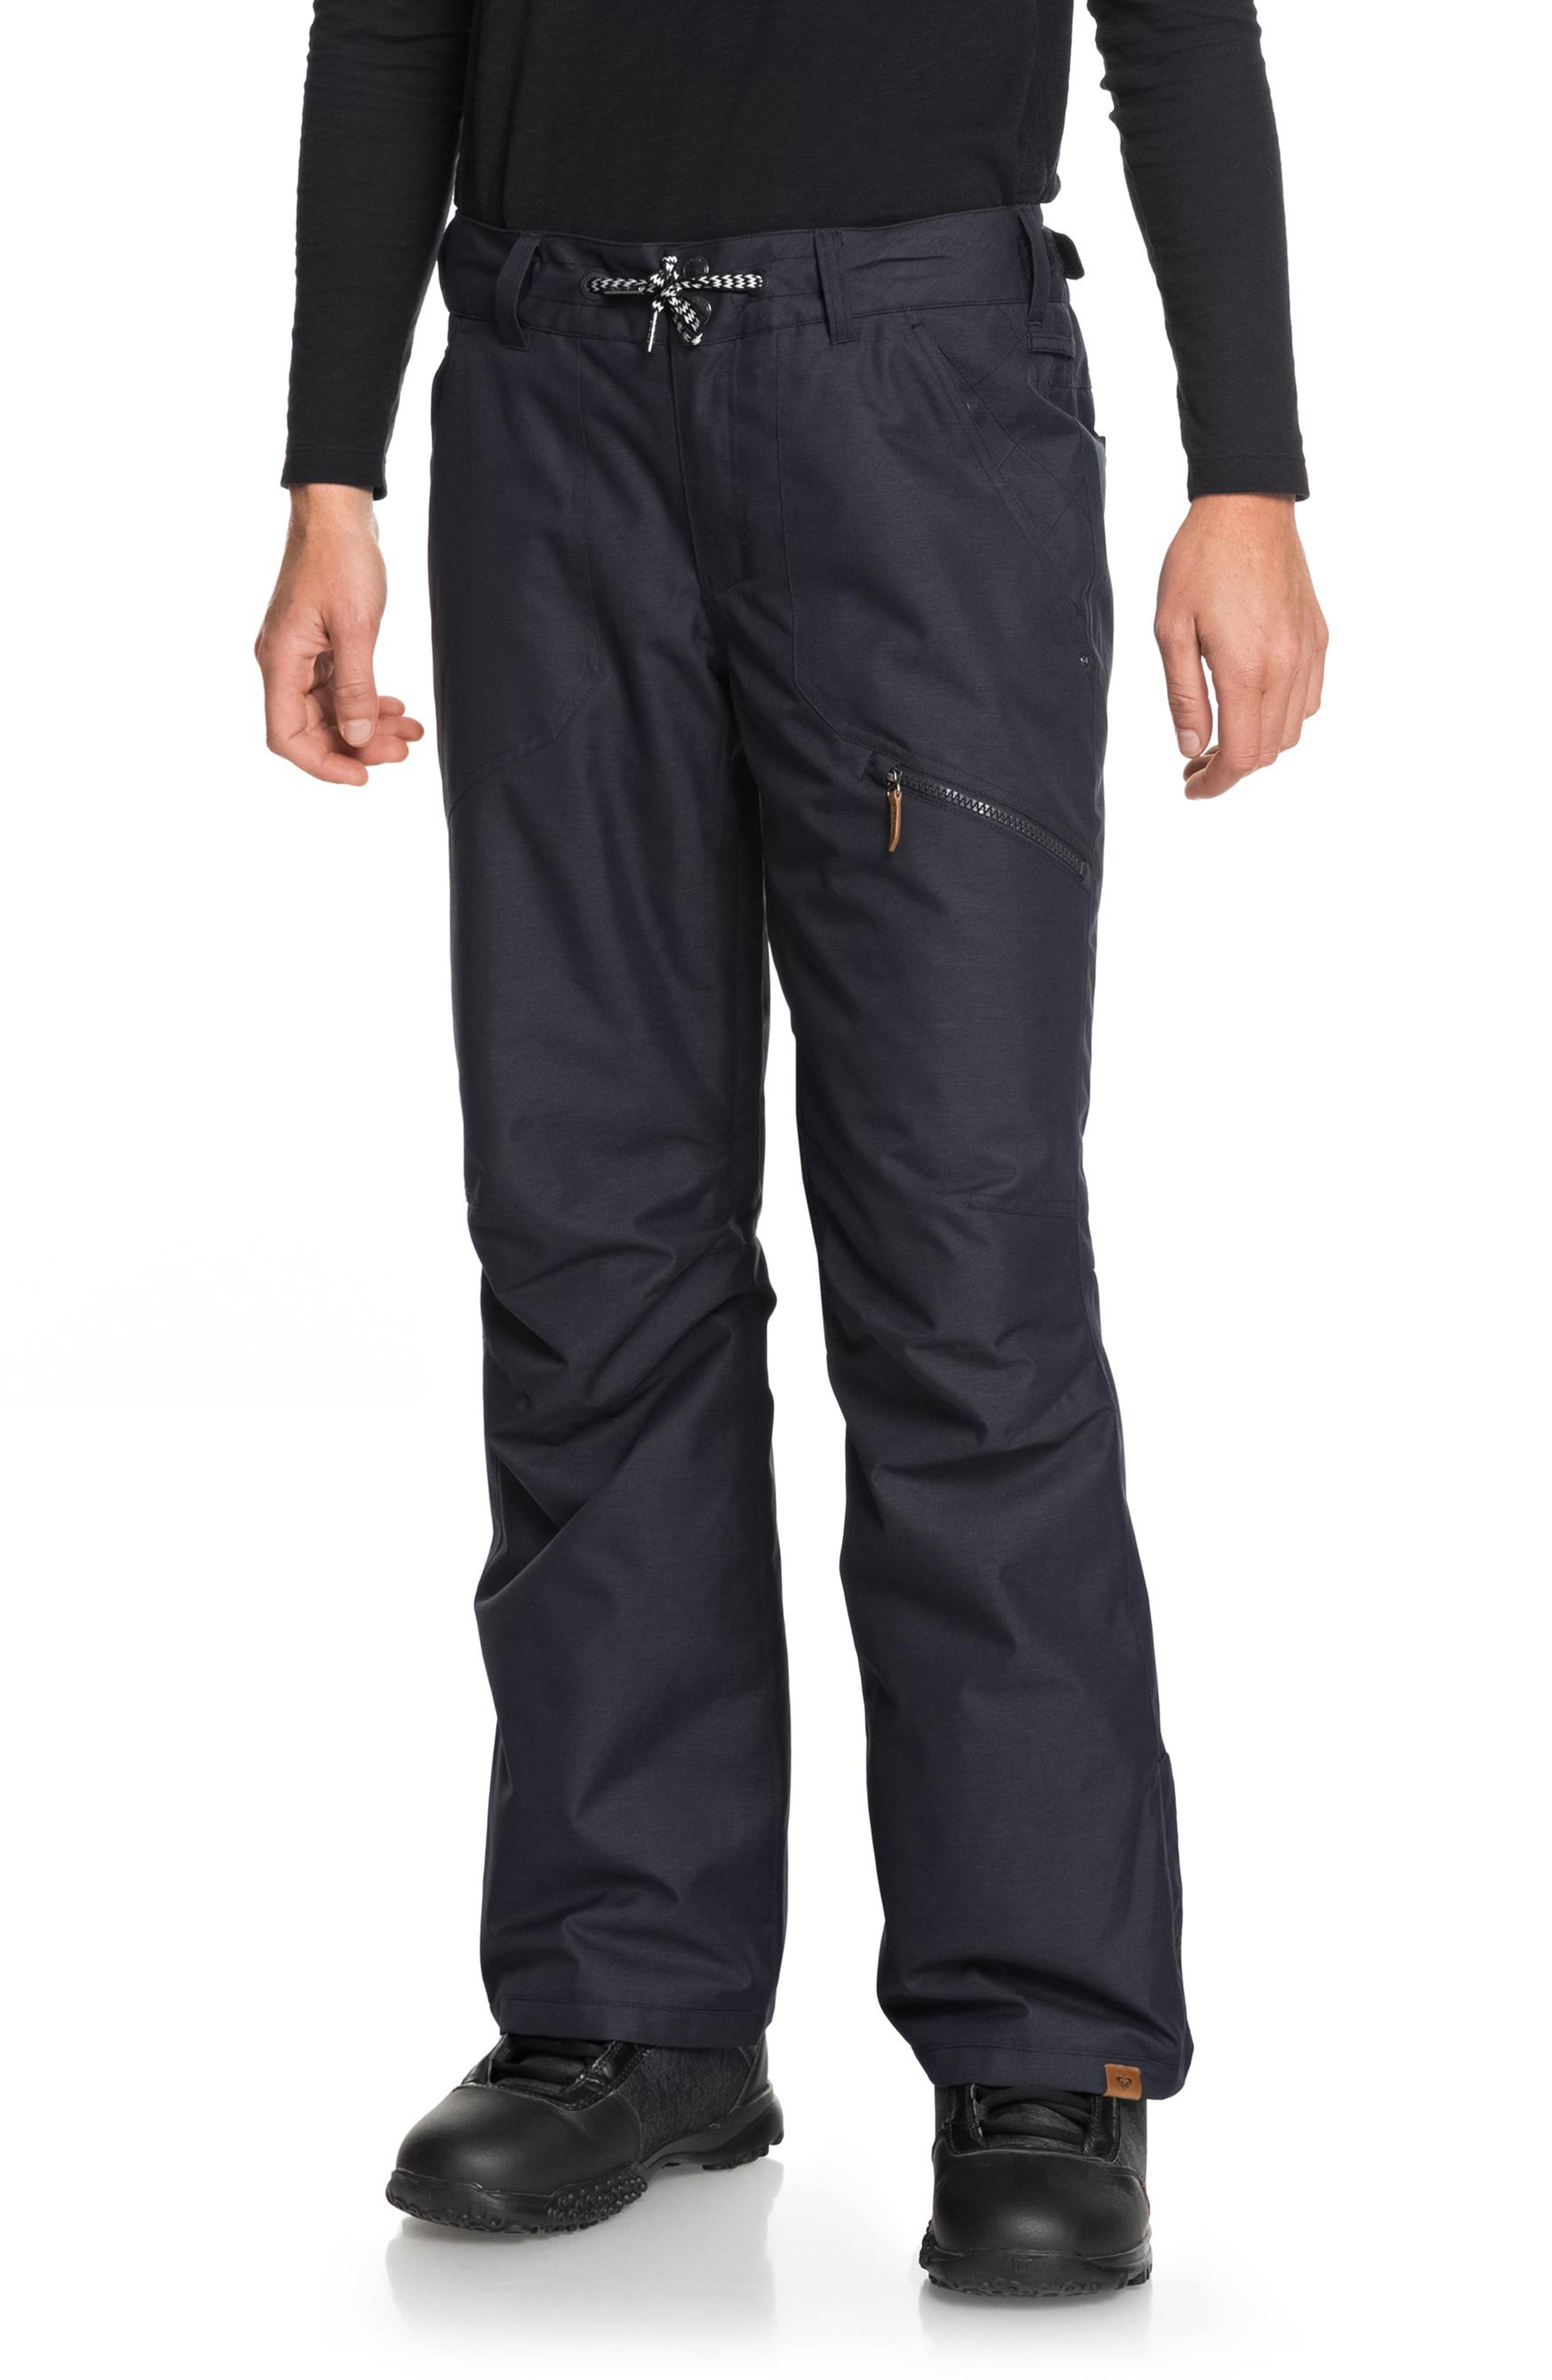 Roxy Nadia Waterproof Dryflight Warmflight Insulated Snow Pants, Black